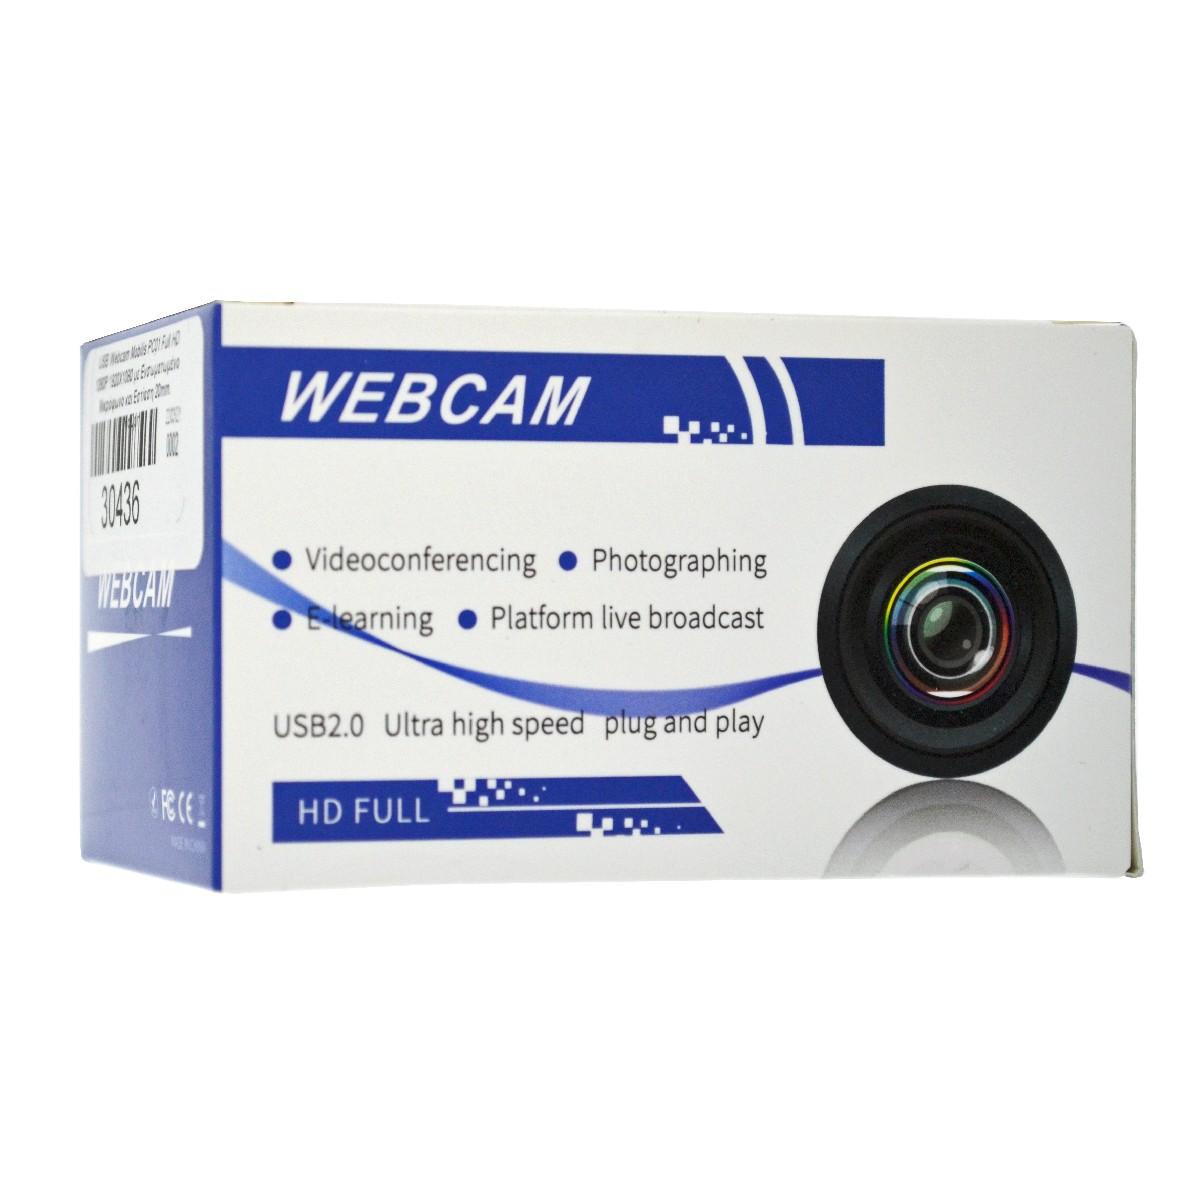 USB Webcam Mobilis PC01 Full HD 1080P 1920X1080 με Ενσωματωμένο Μικρόφωνο και Εστίαση 20mm. Μαύρη